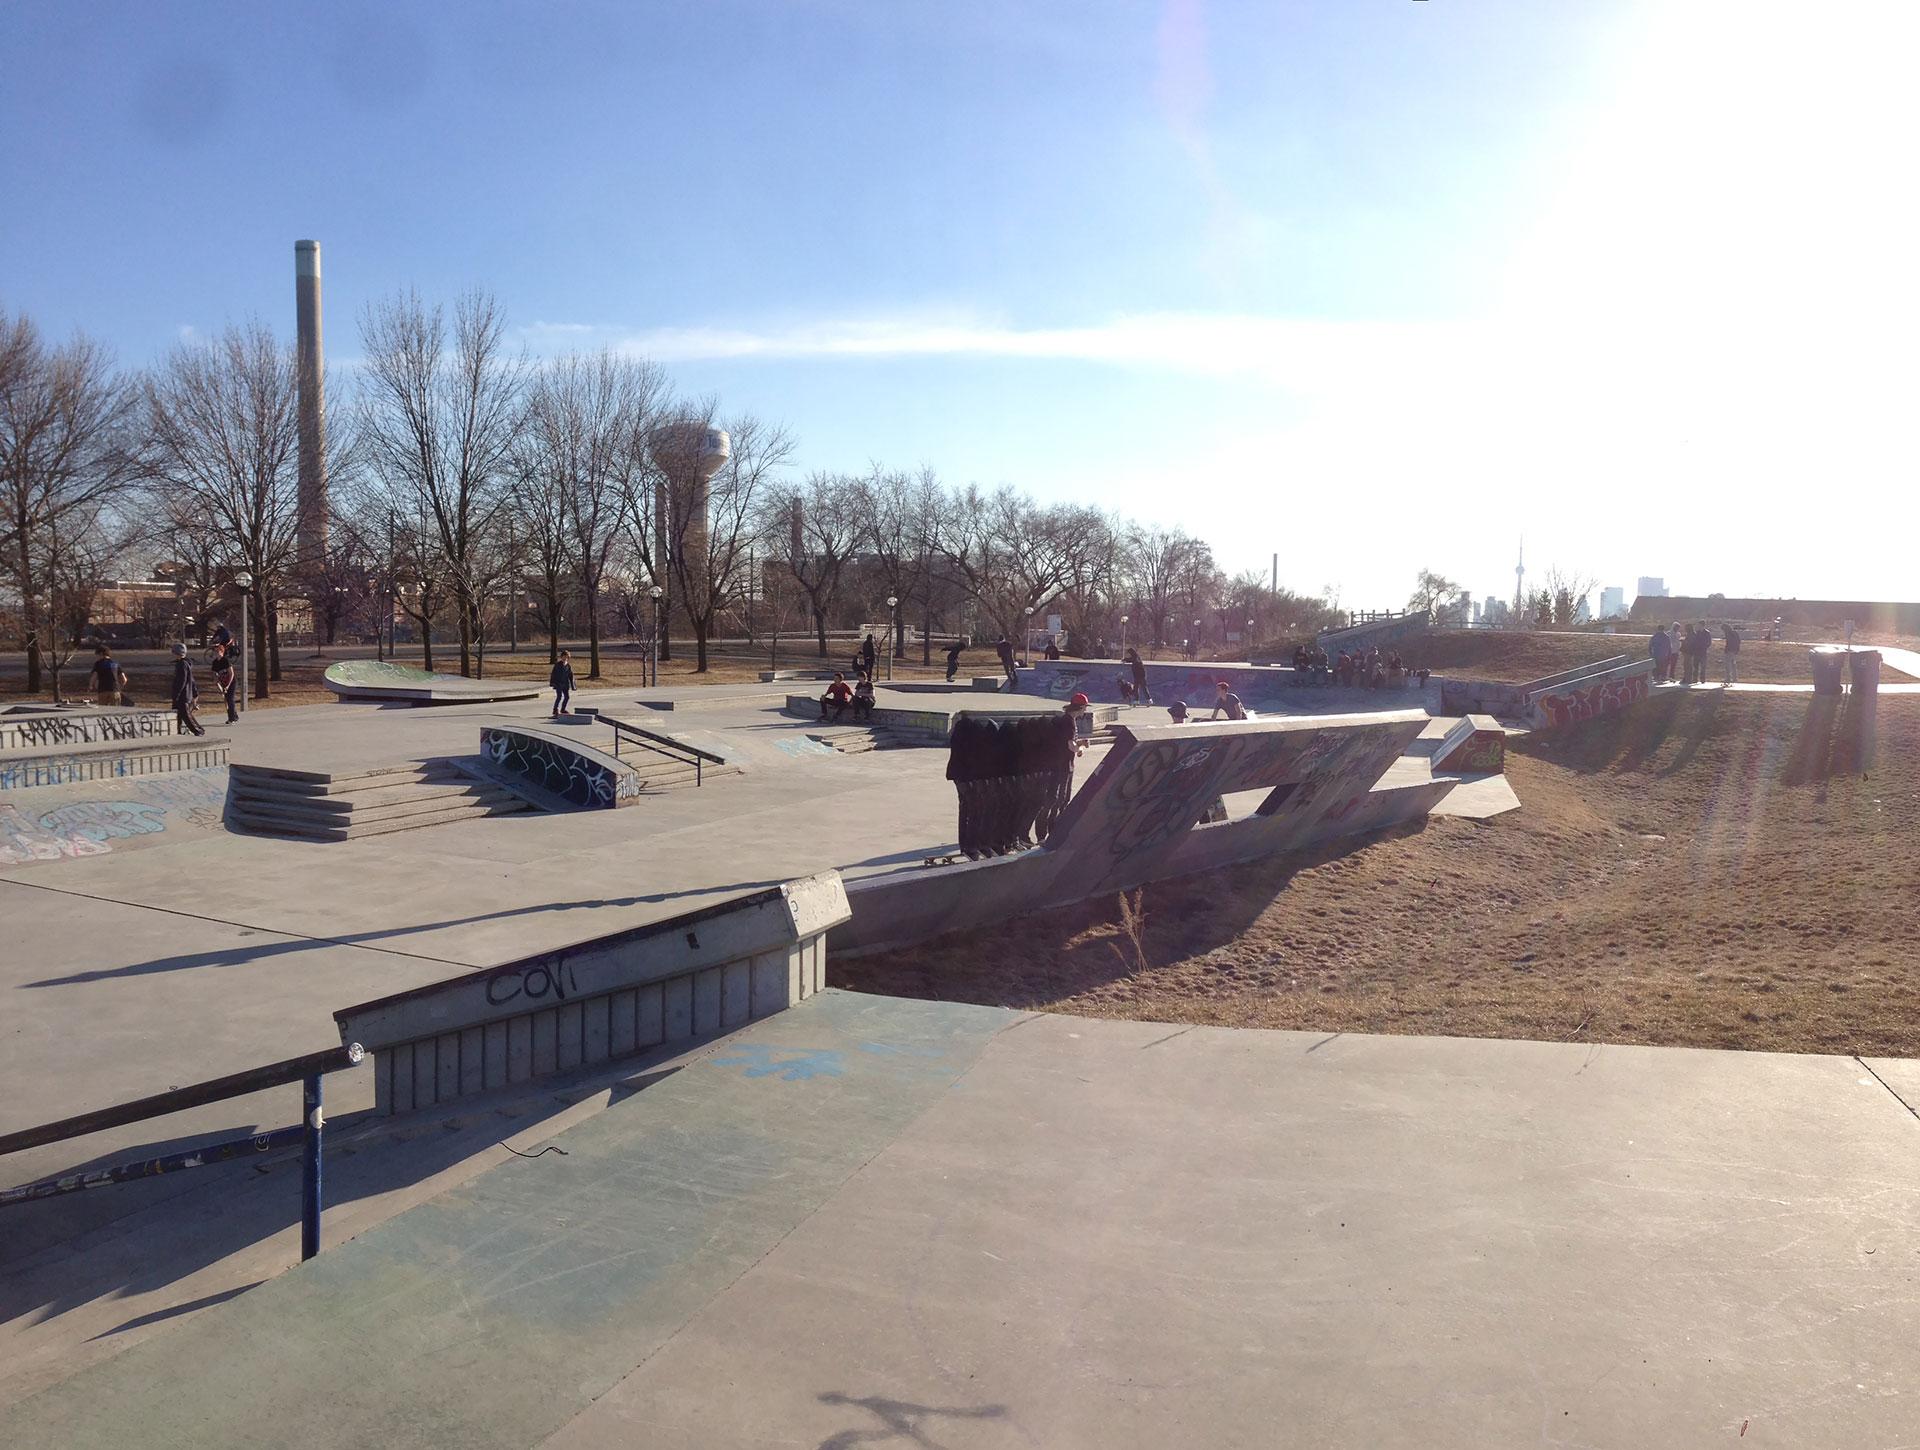 Toronto Beaches skatepark